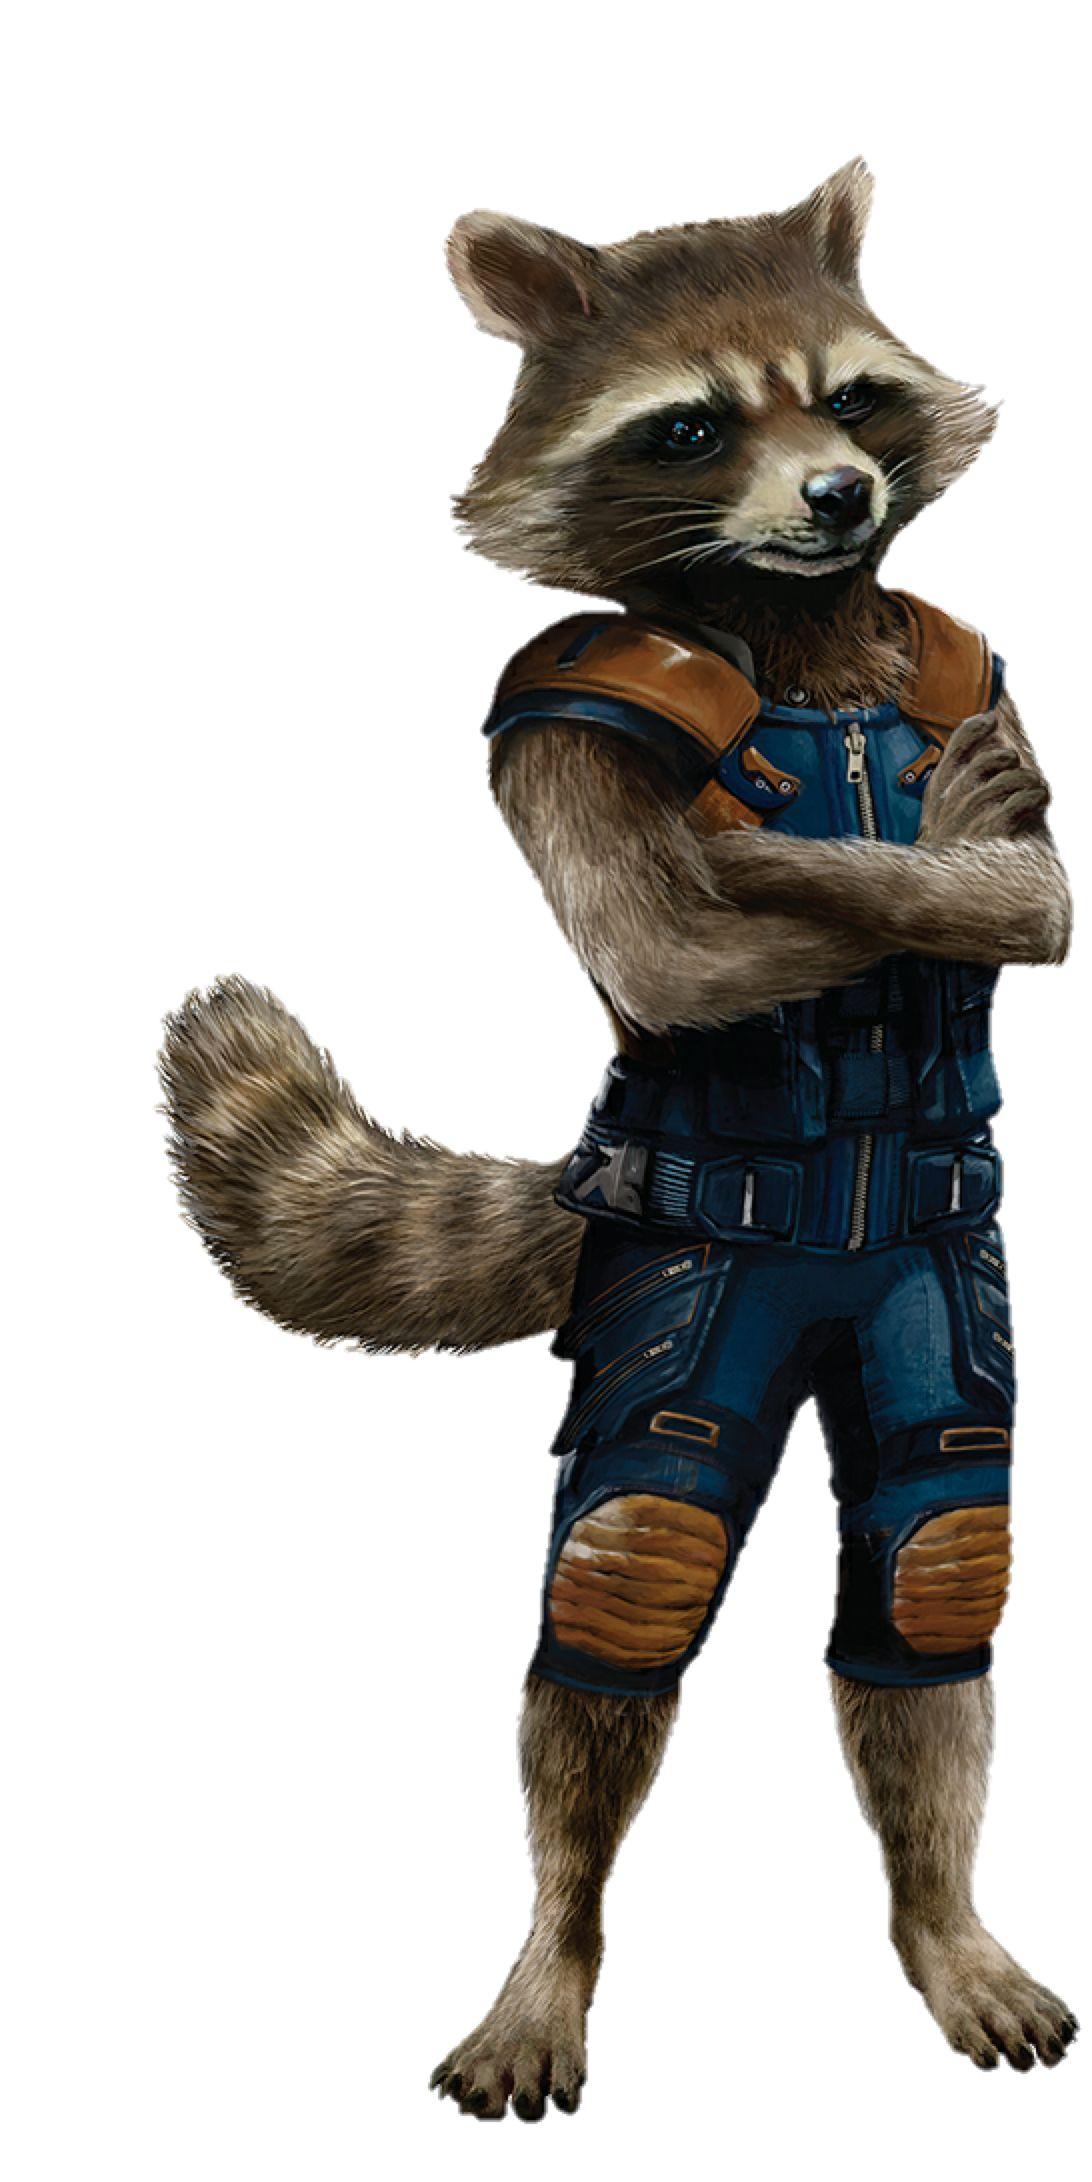 Guardians Of The Galaxy Vol 2 Rocket Png By Metropolis Hero1125 On Deviantart Gardians Of The Galaxy Rocket Raccoon Marvel Comics Wallpaper